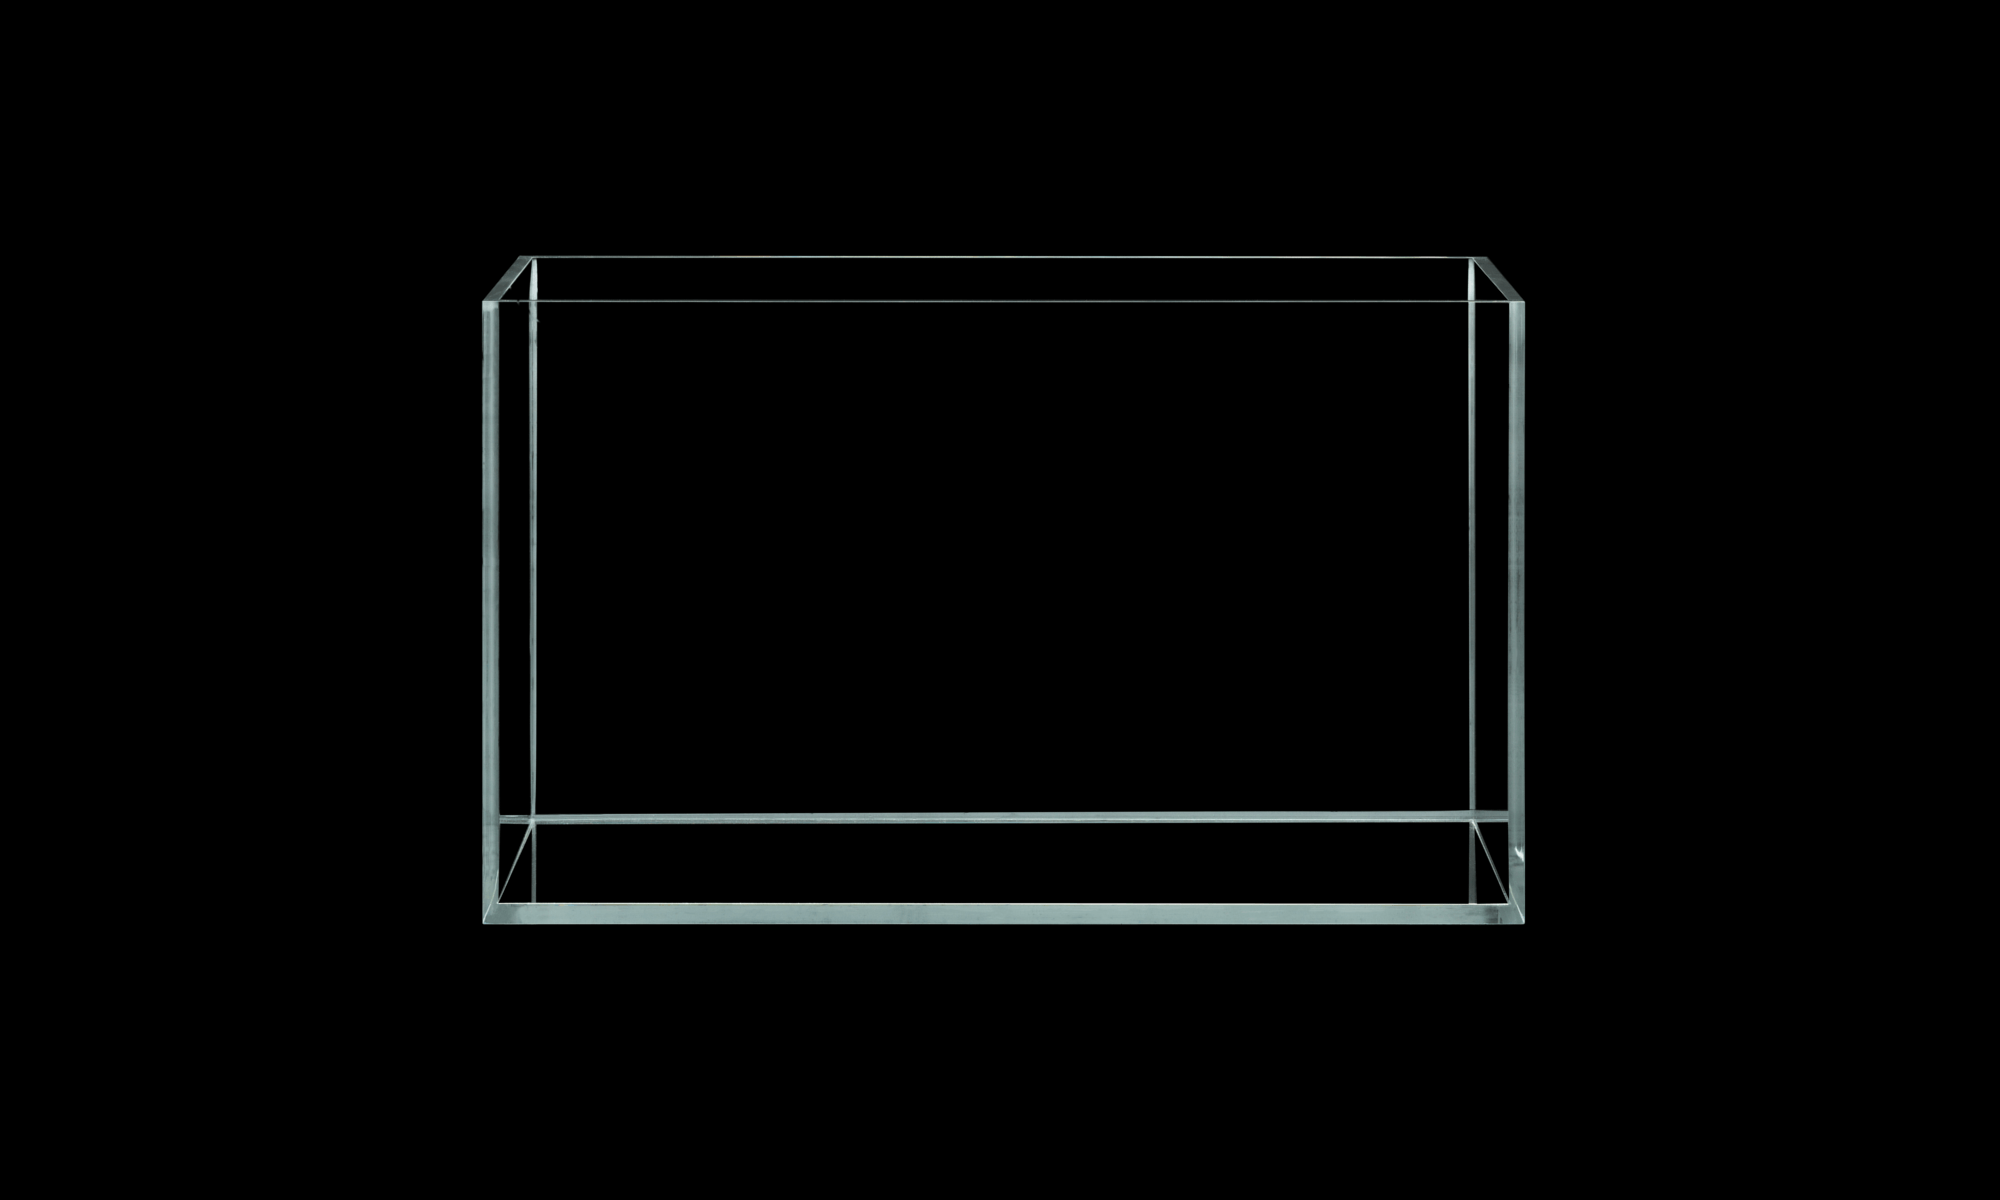 aquascaping unterschiede zu floatglas vs wei glas vs acryl aquarium. Black Bedroom Furniture Sets. Home Design Ideas